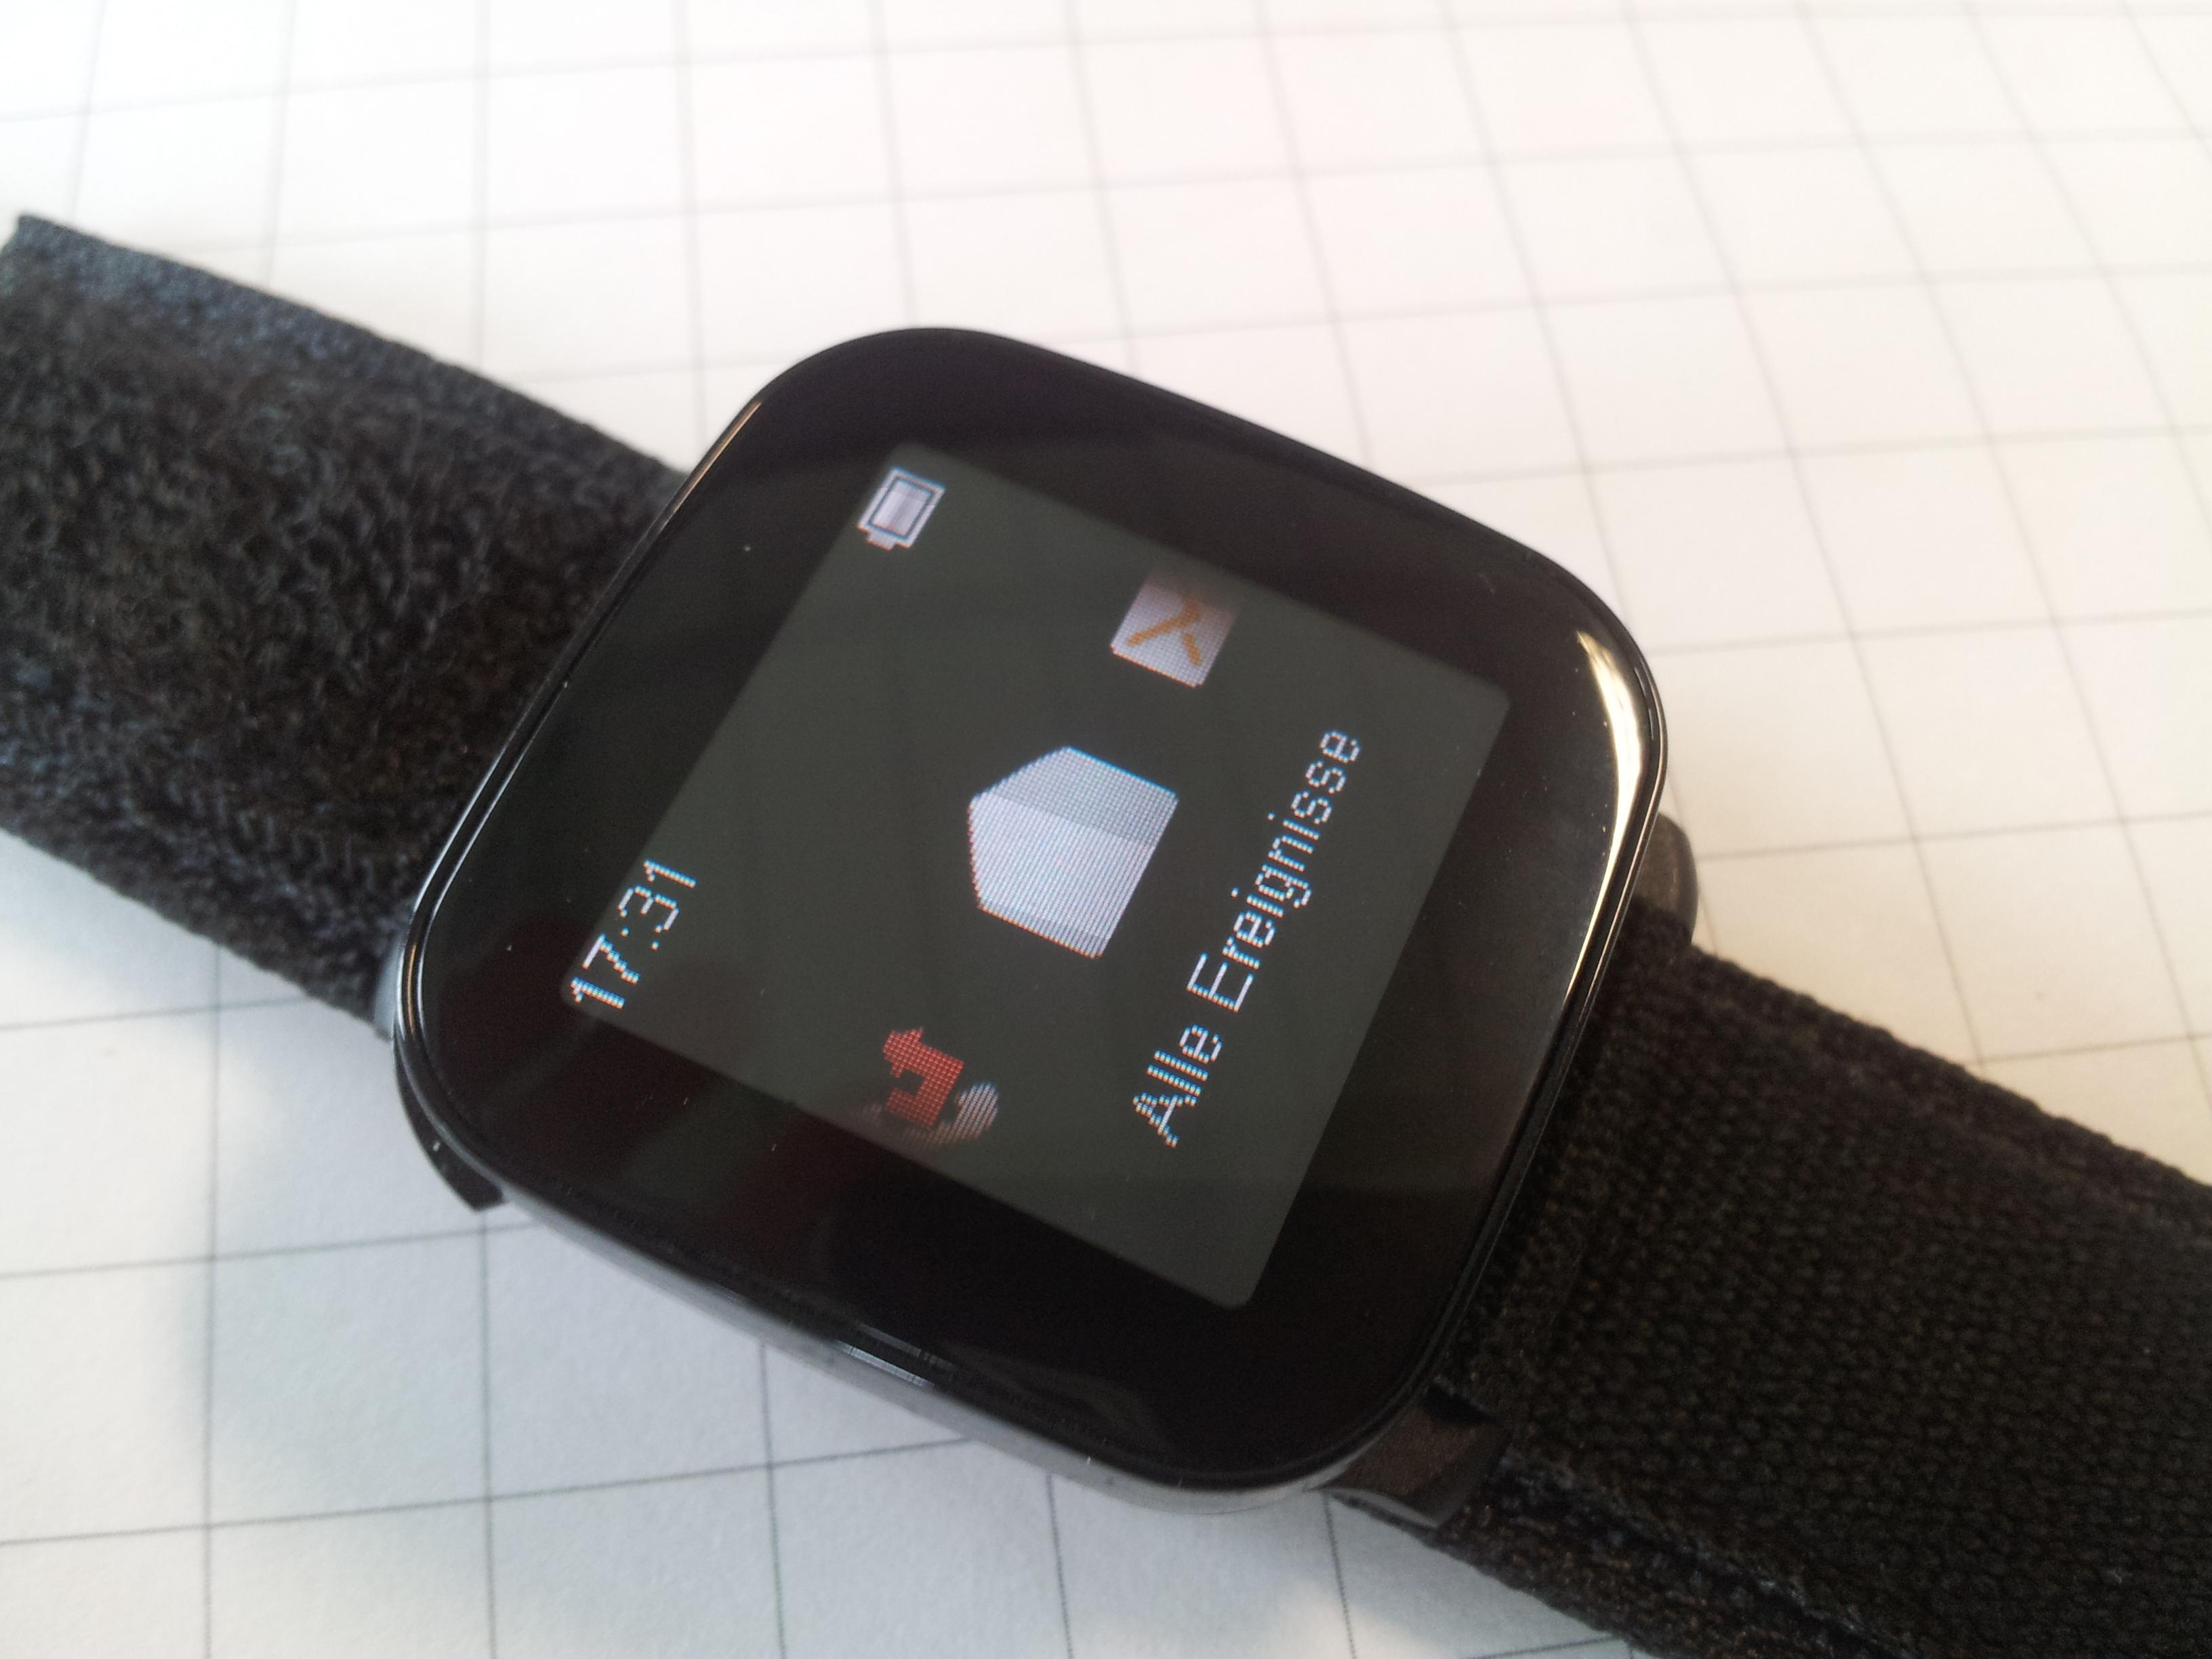 Workaround: Sony Erricson LiveView Plug-ins unter Android 4.0/ICS benutzen